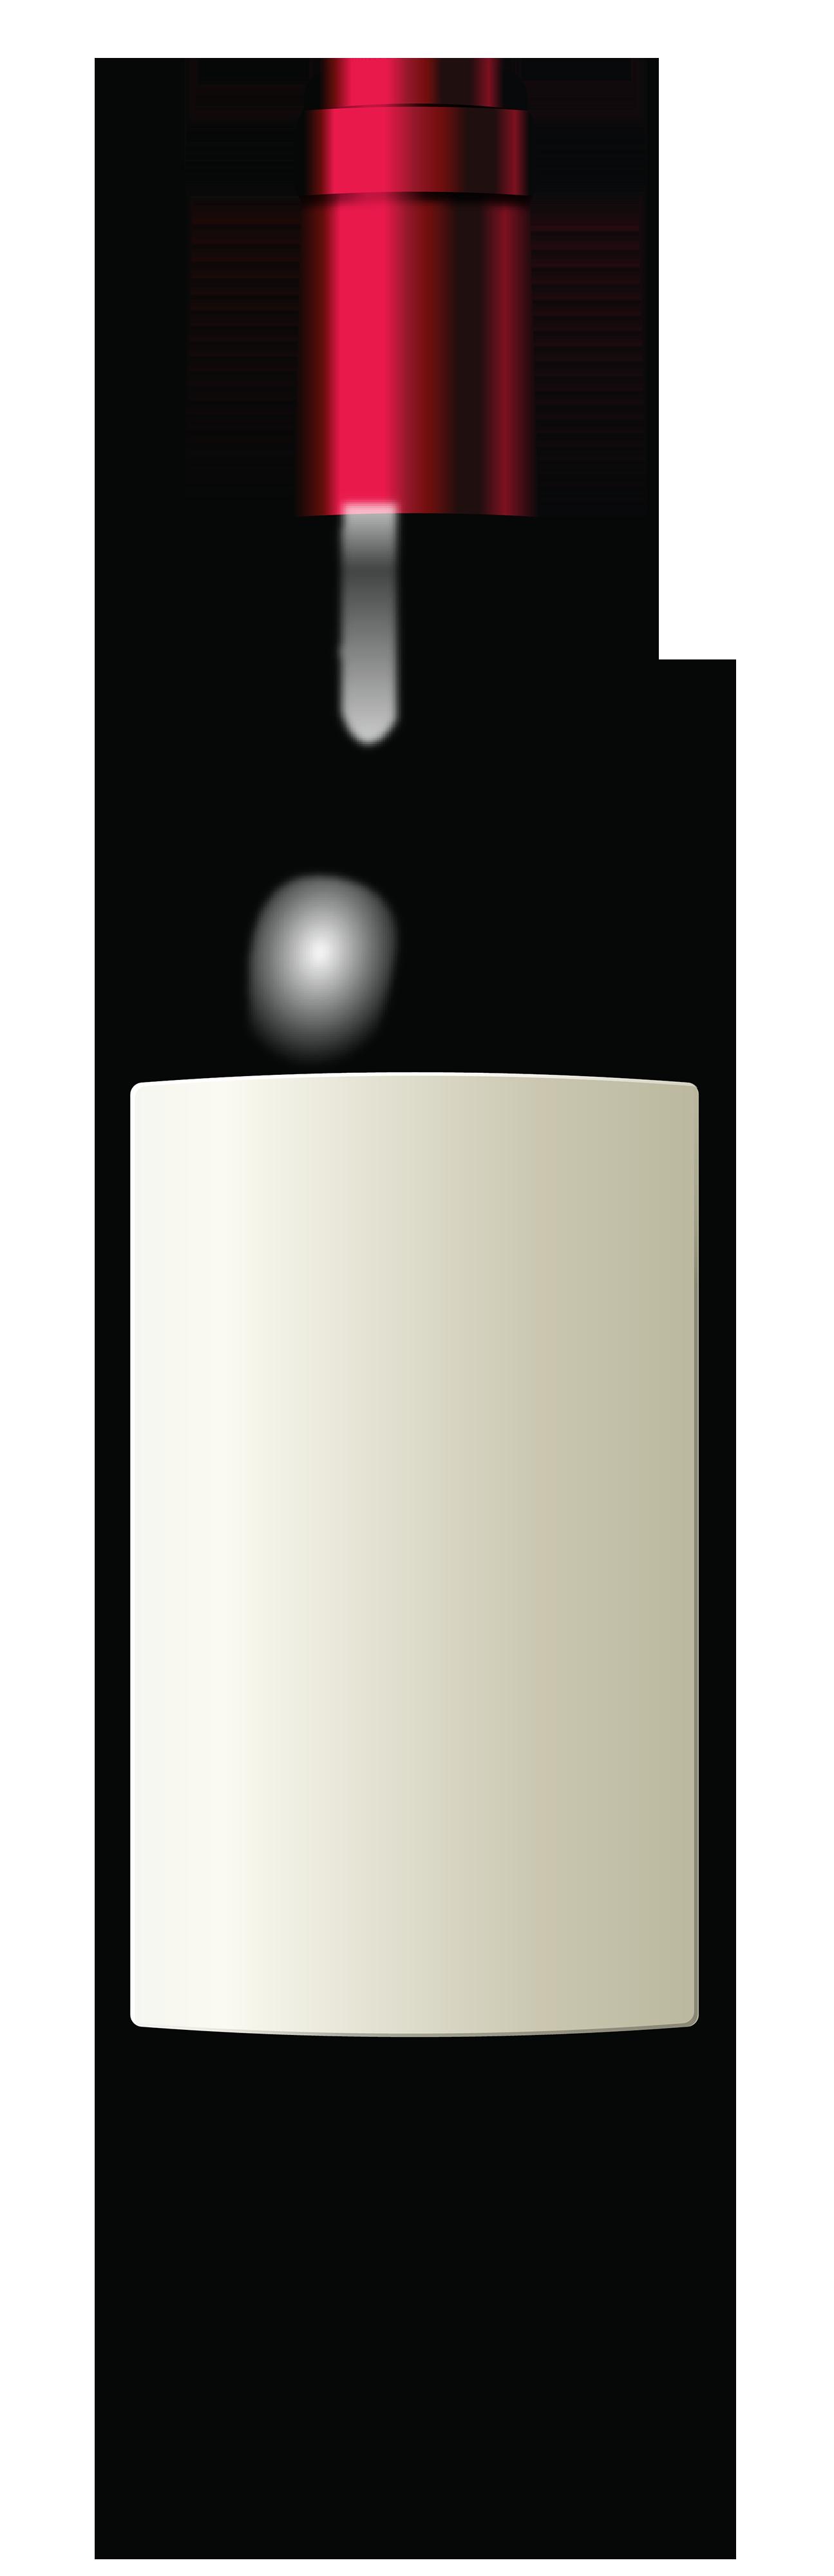 Wine bottle clipart the .